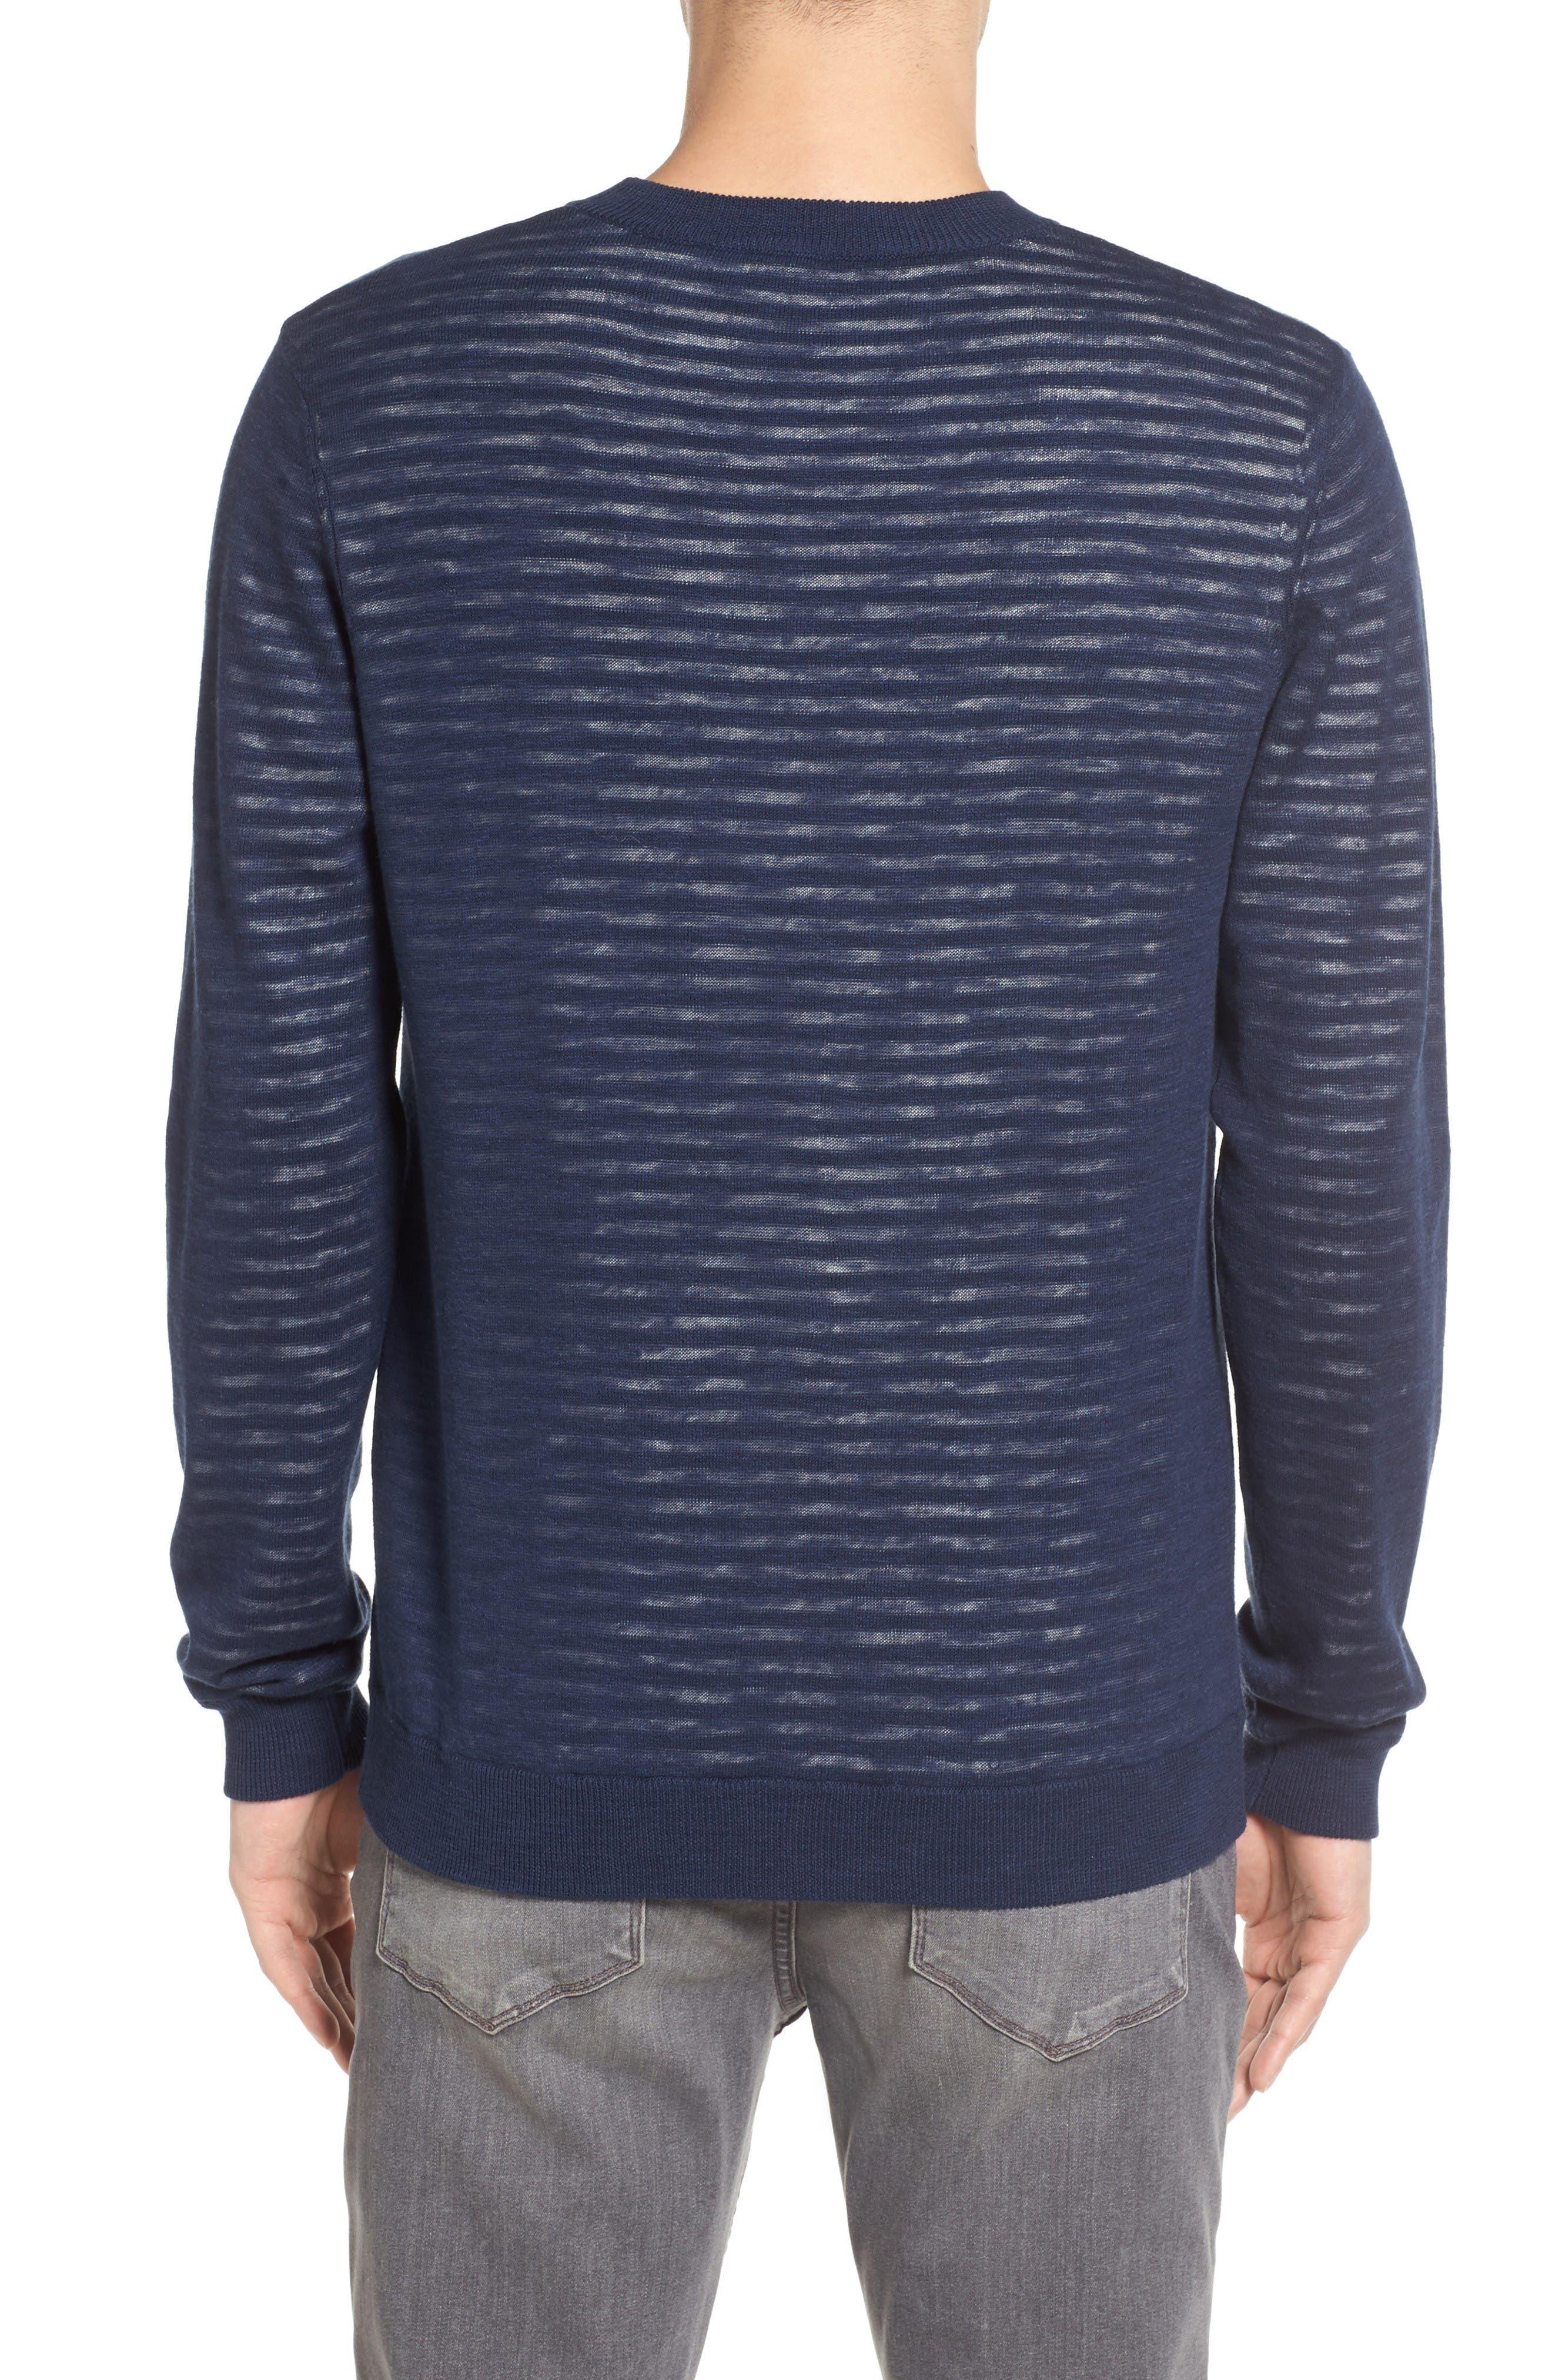 Luca Reversible Cotton & Linen Pullover,                             Alternate thumbnail 2, color,                             Turbid Stripe Night Sea/ White